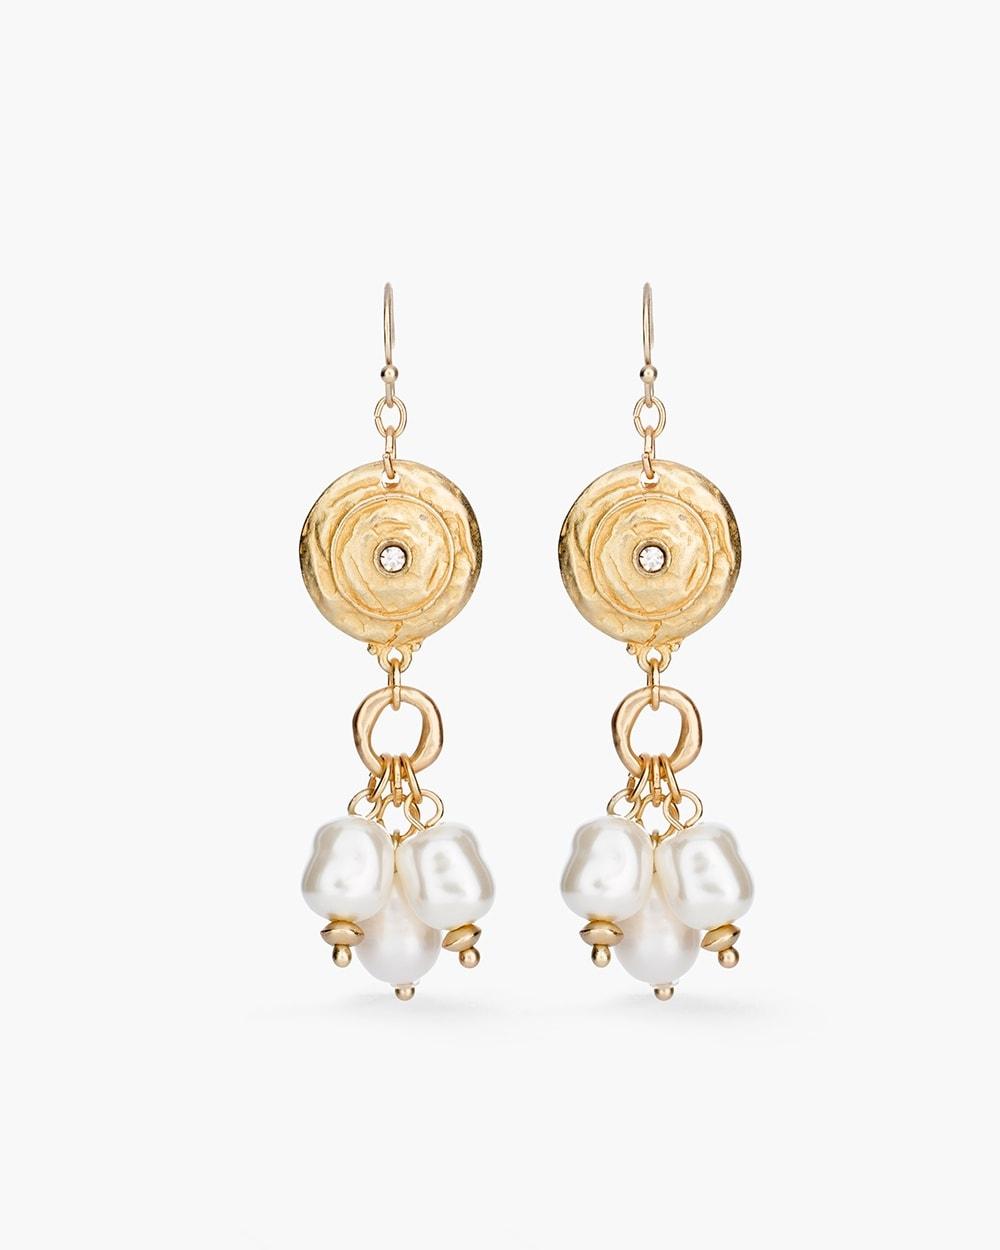 d78981aa7 2015 Punjabi Chandelier Earrings Wholesale Kundan Pakistani Wedding. Pearl  And Crystal Chandelier Earrings David S Bridal. Faux Pearl Chandelier  Earrings ...